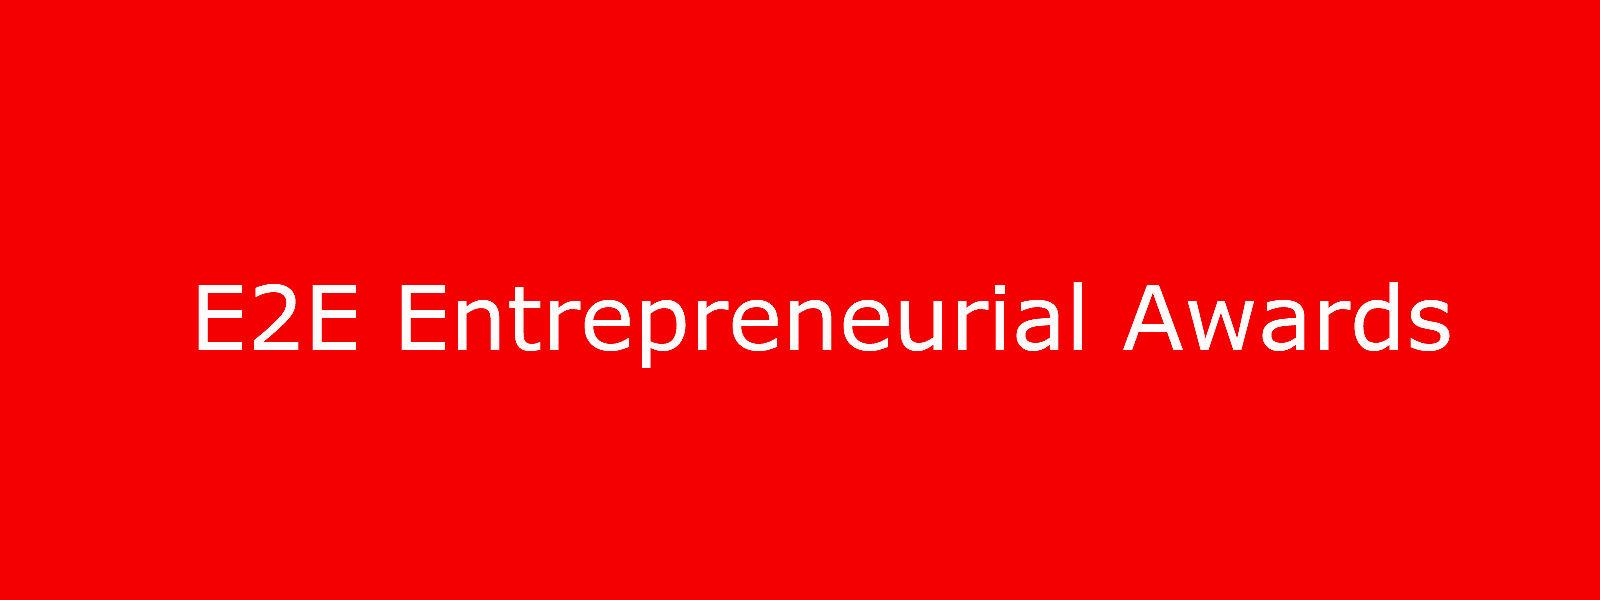 E2E Entreprenerial Awards.jpg